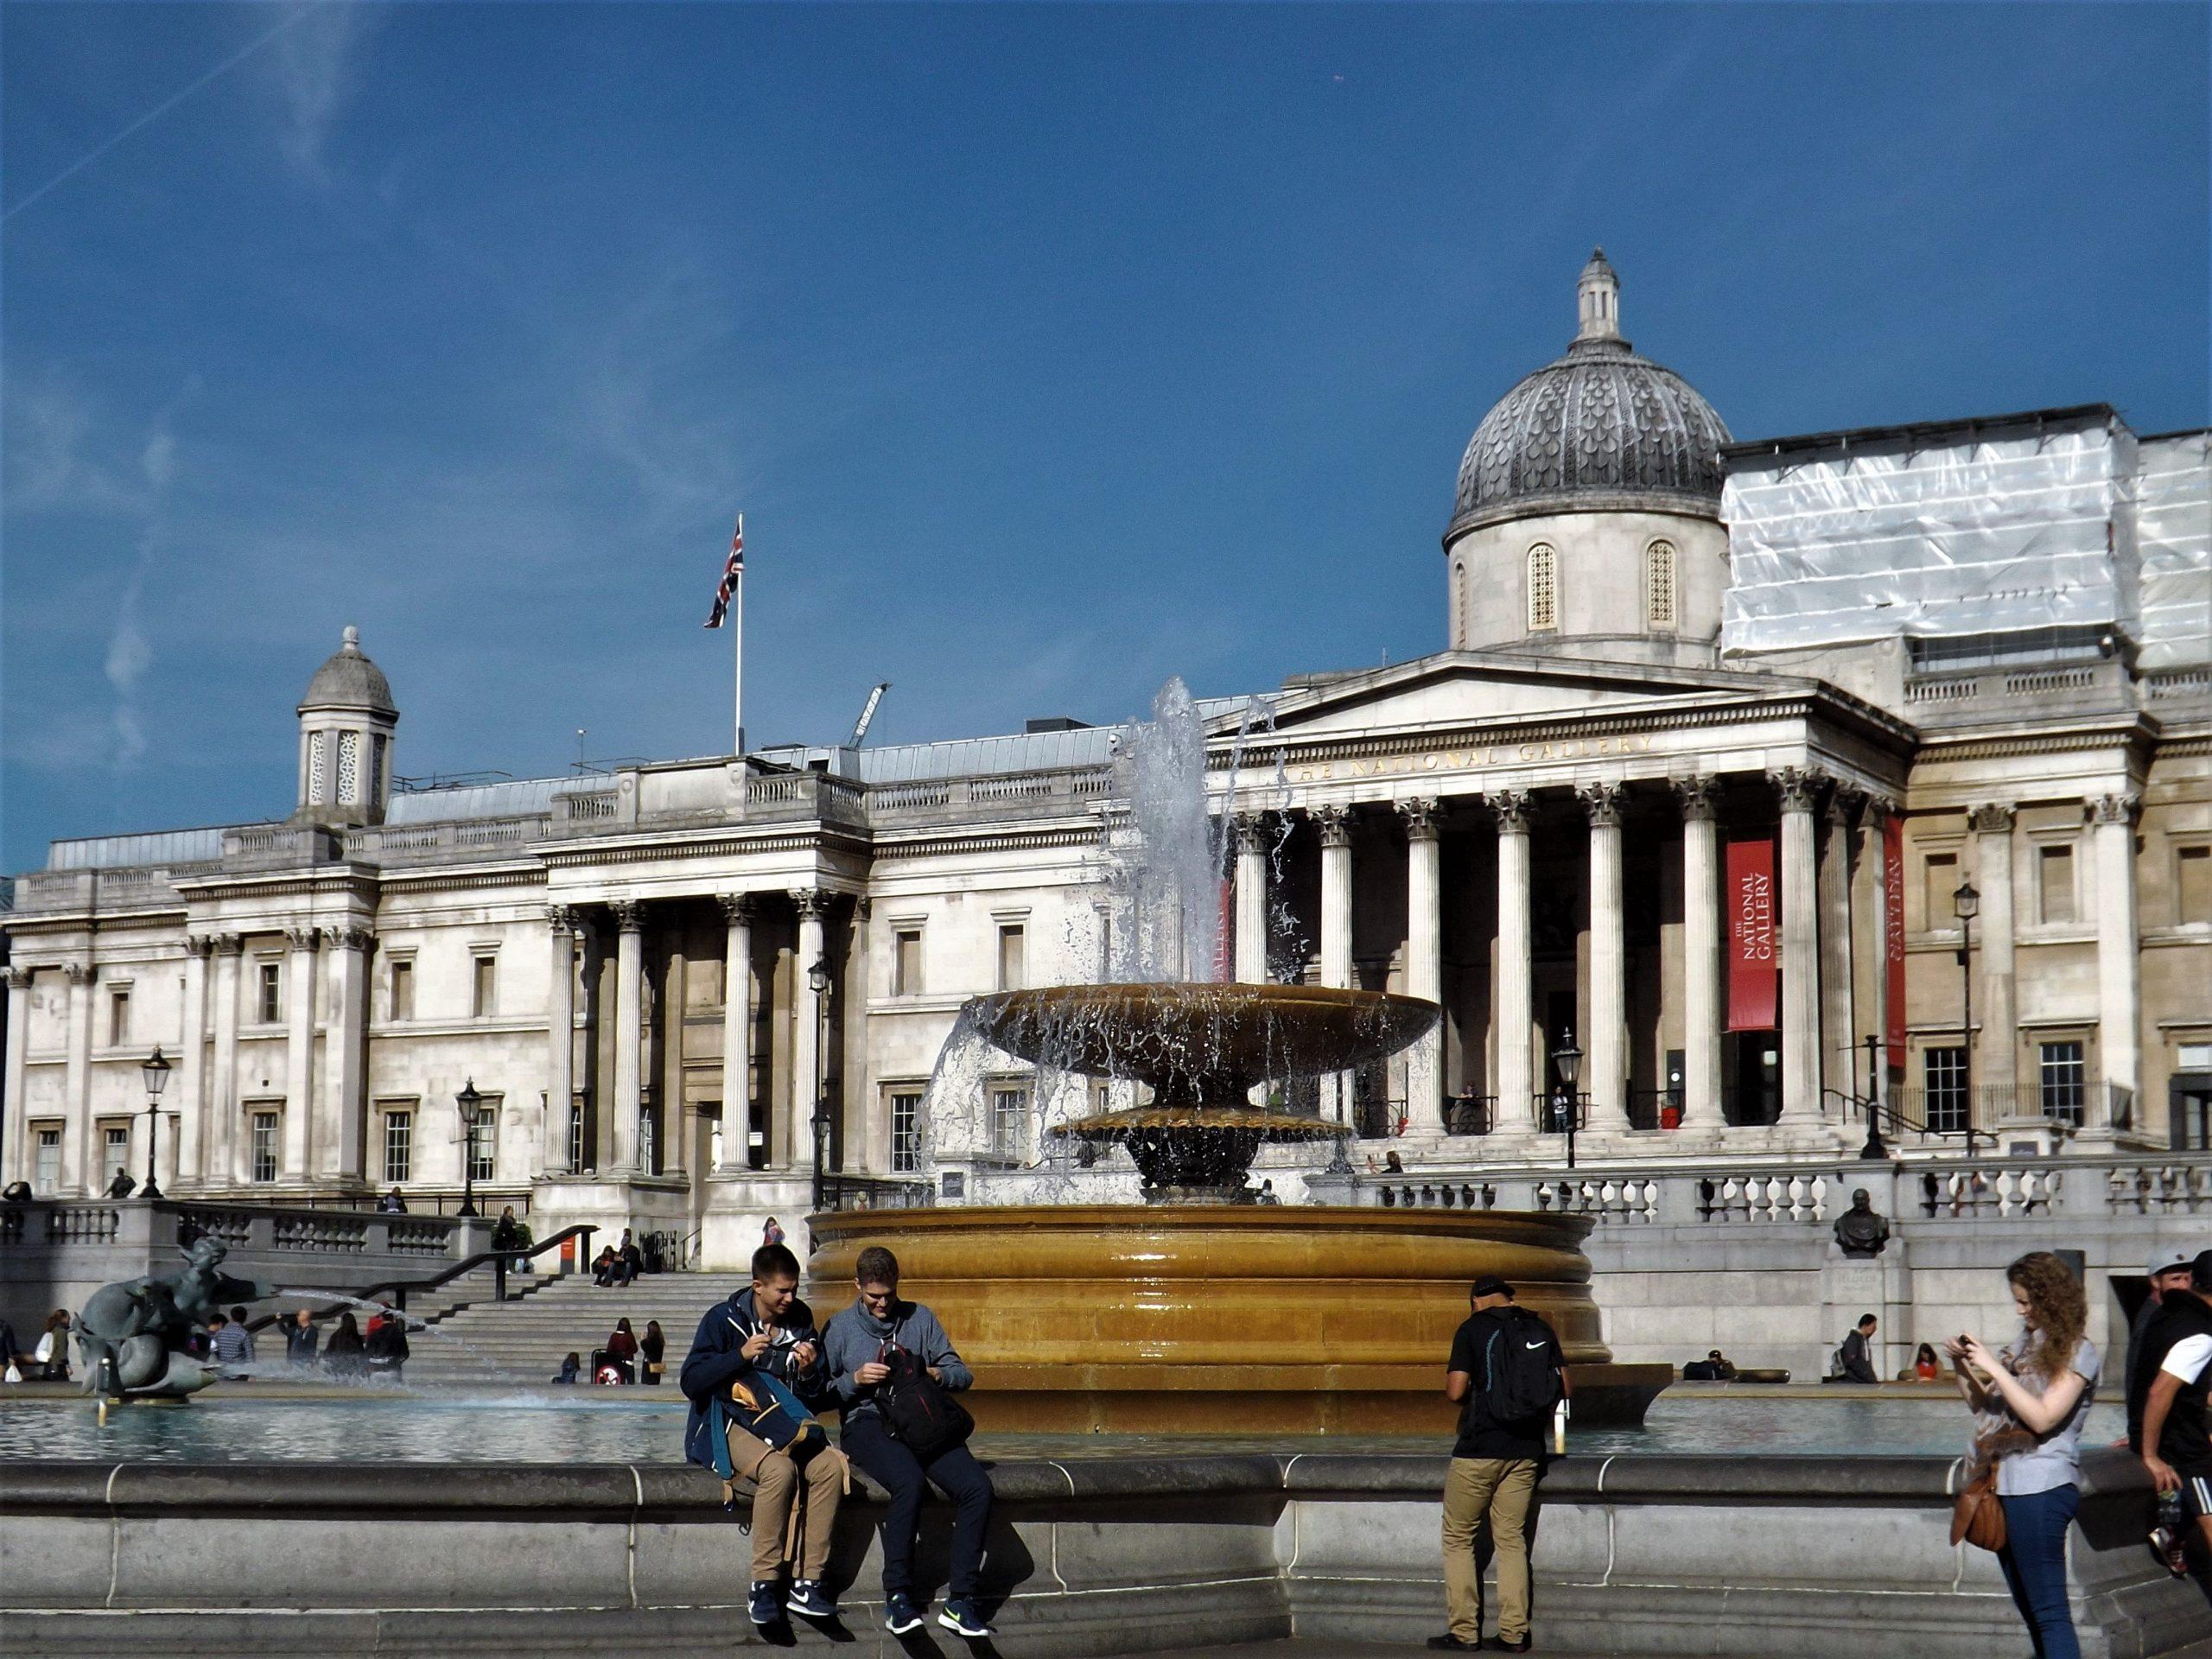 RTW Budget: London